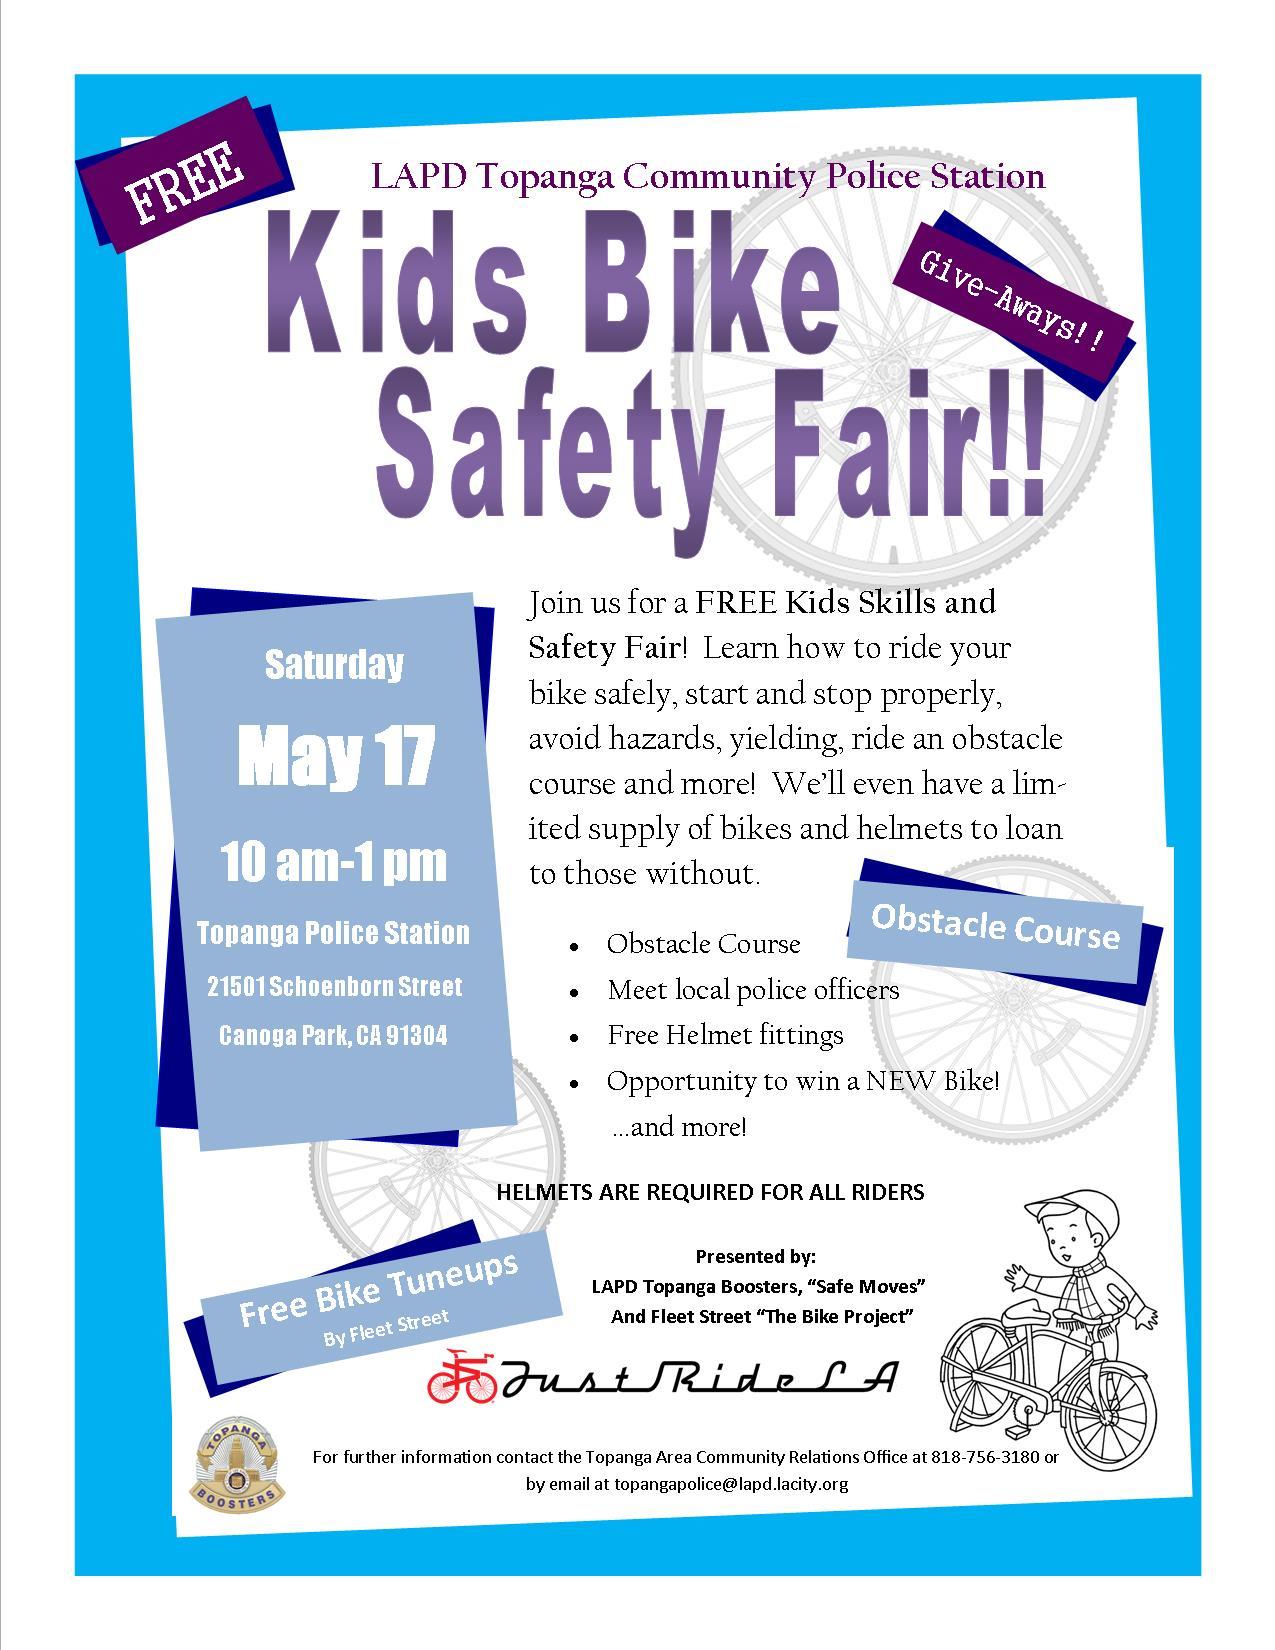 Bike_Safety_Fair_Flyer.jpg